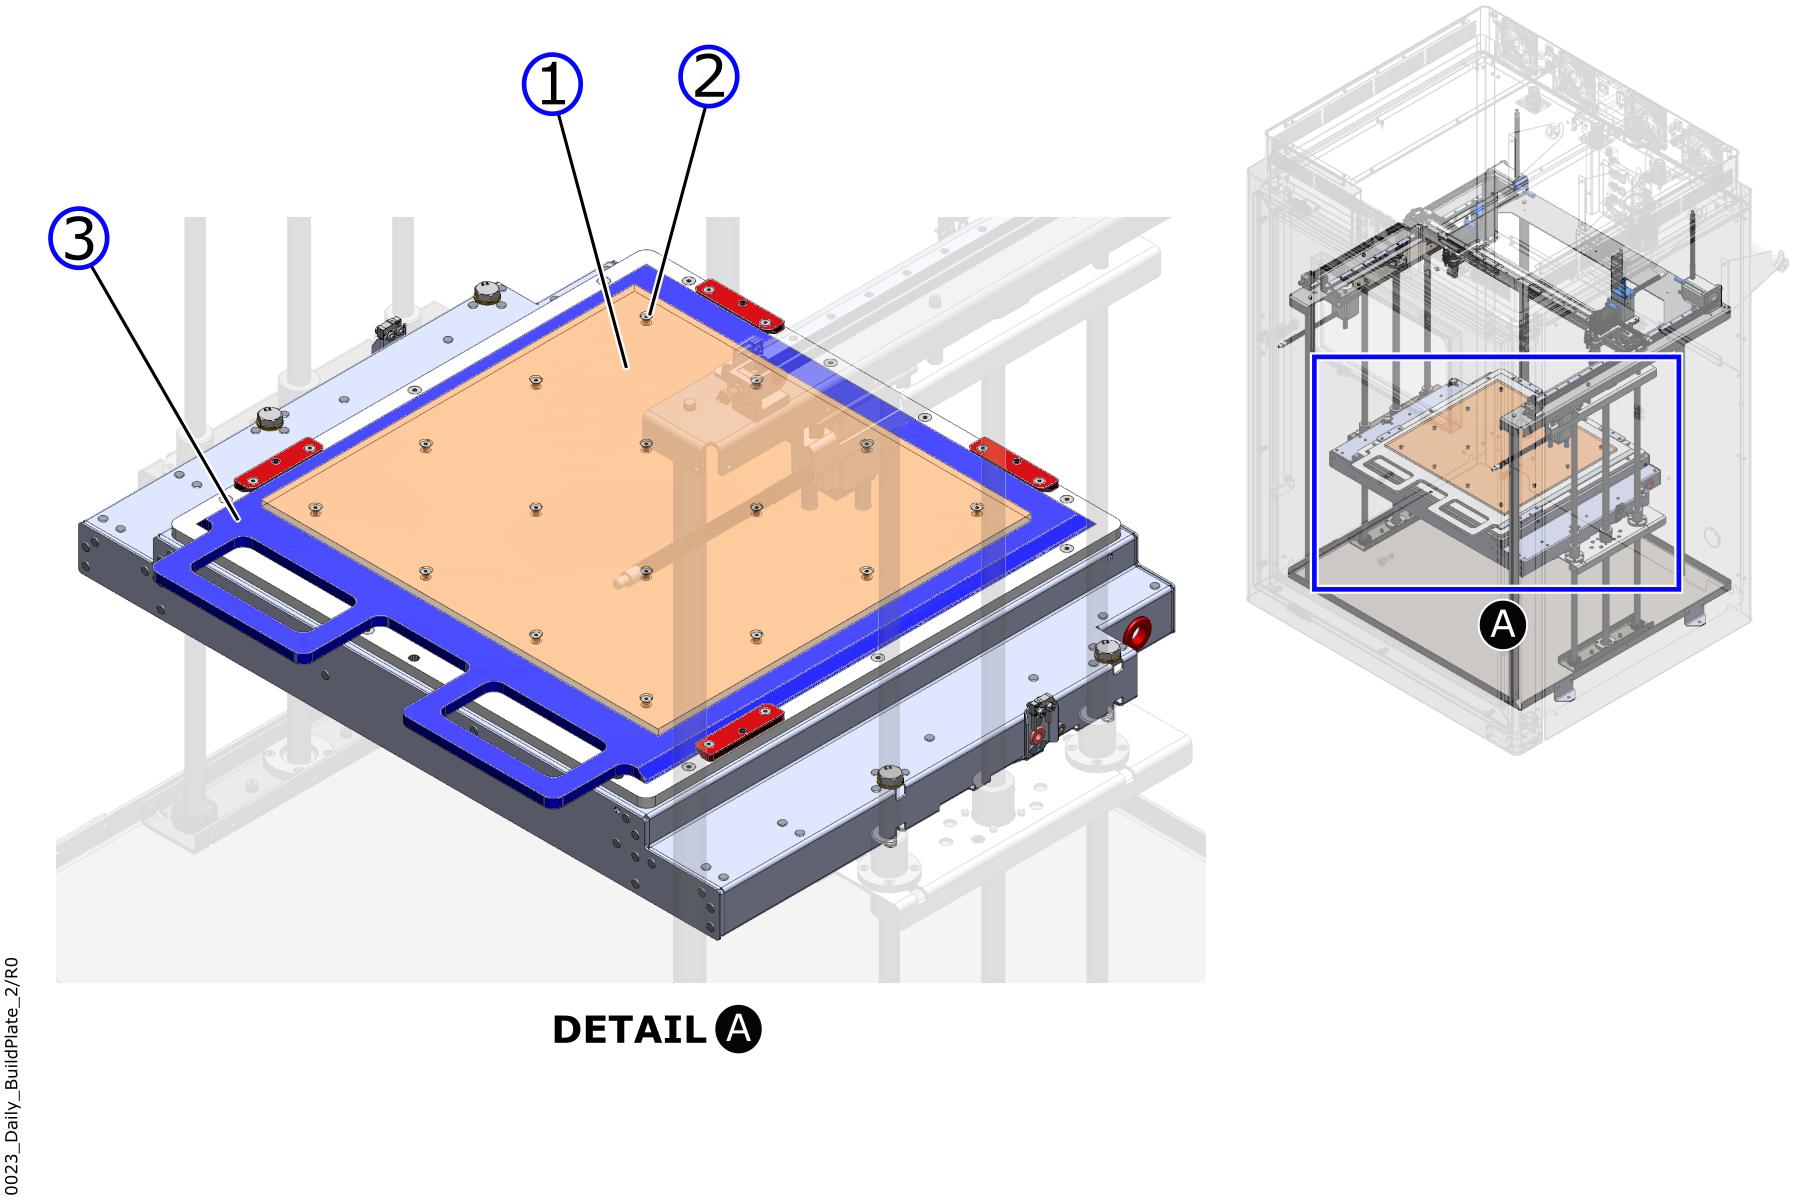 Build Plate Screws